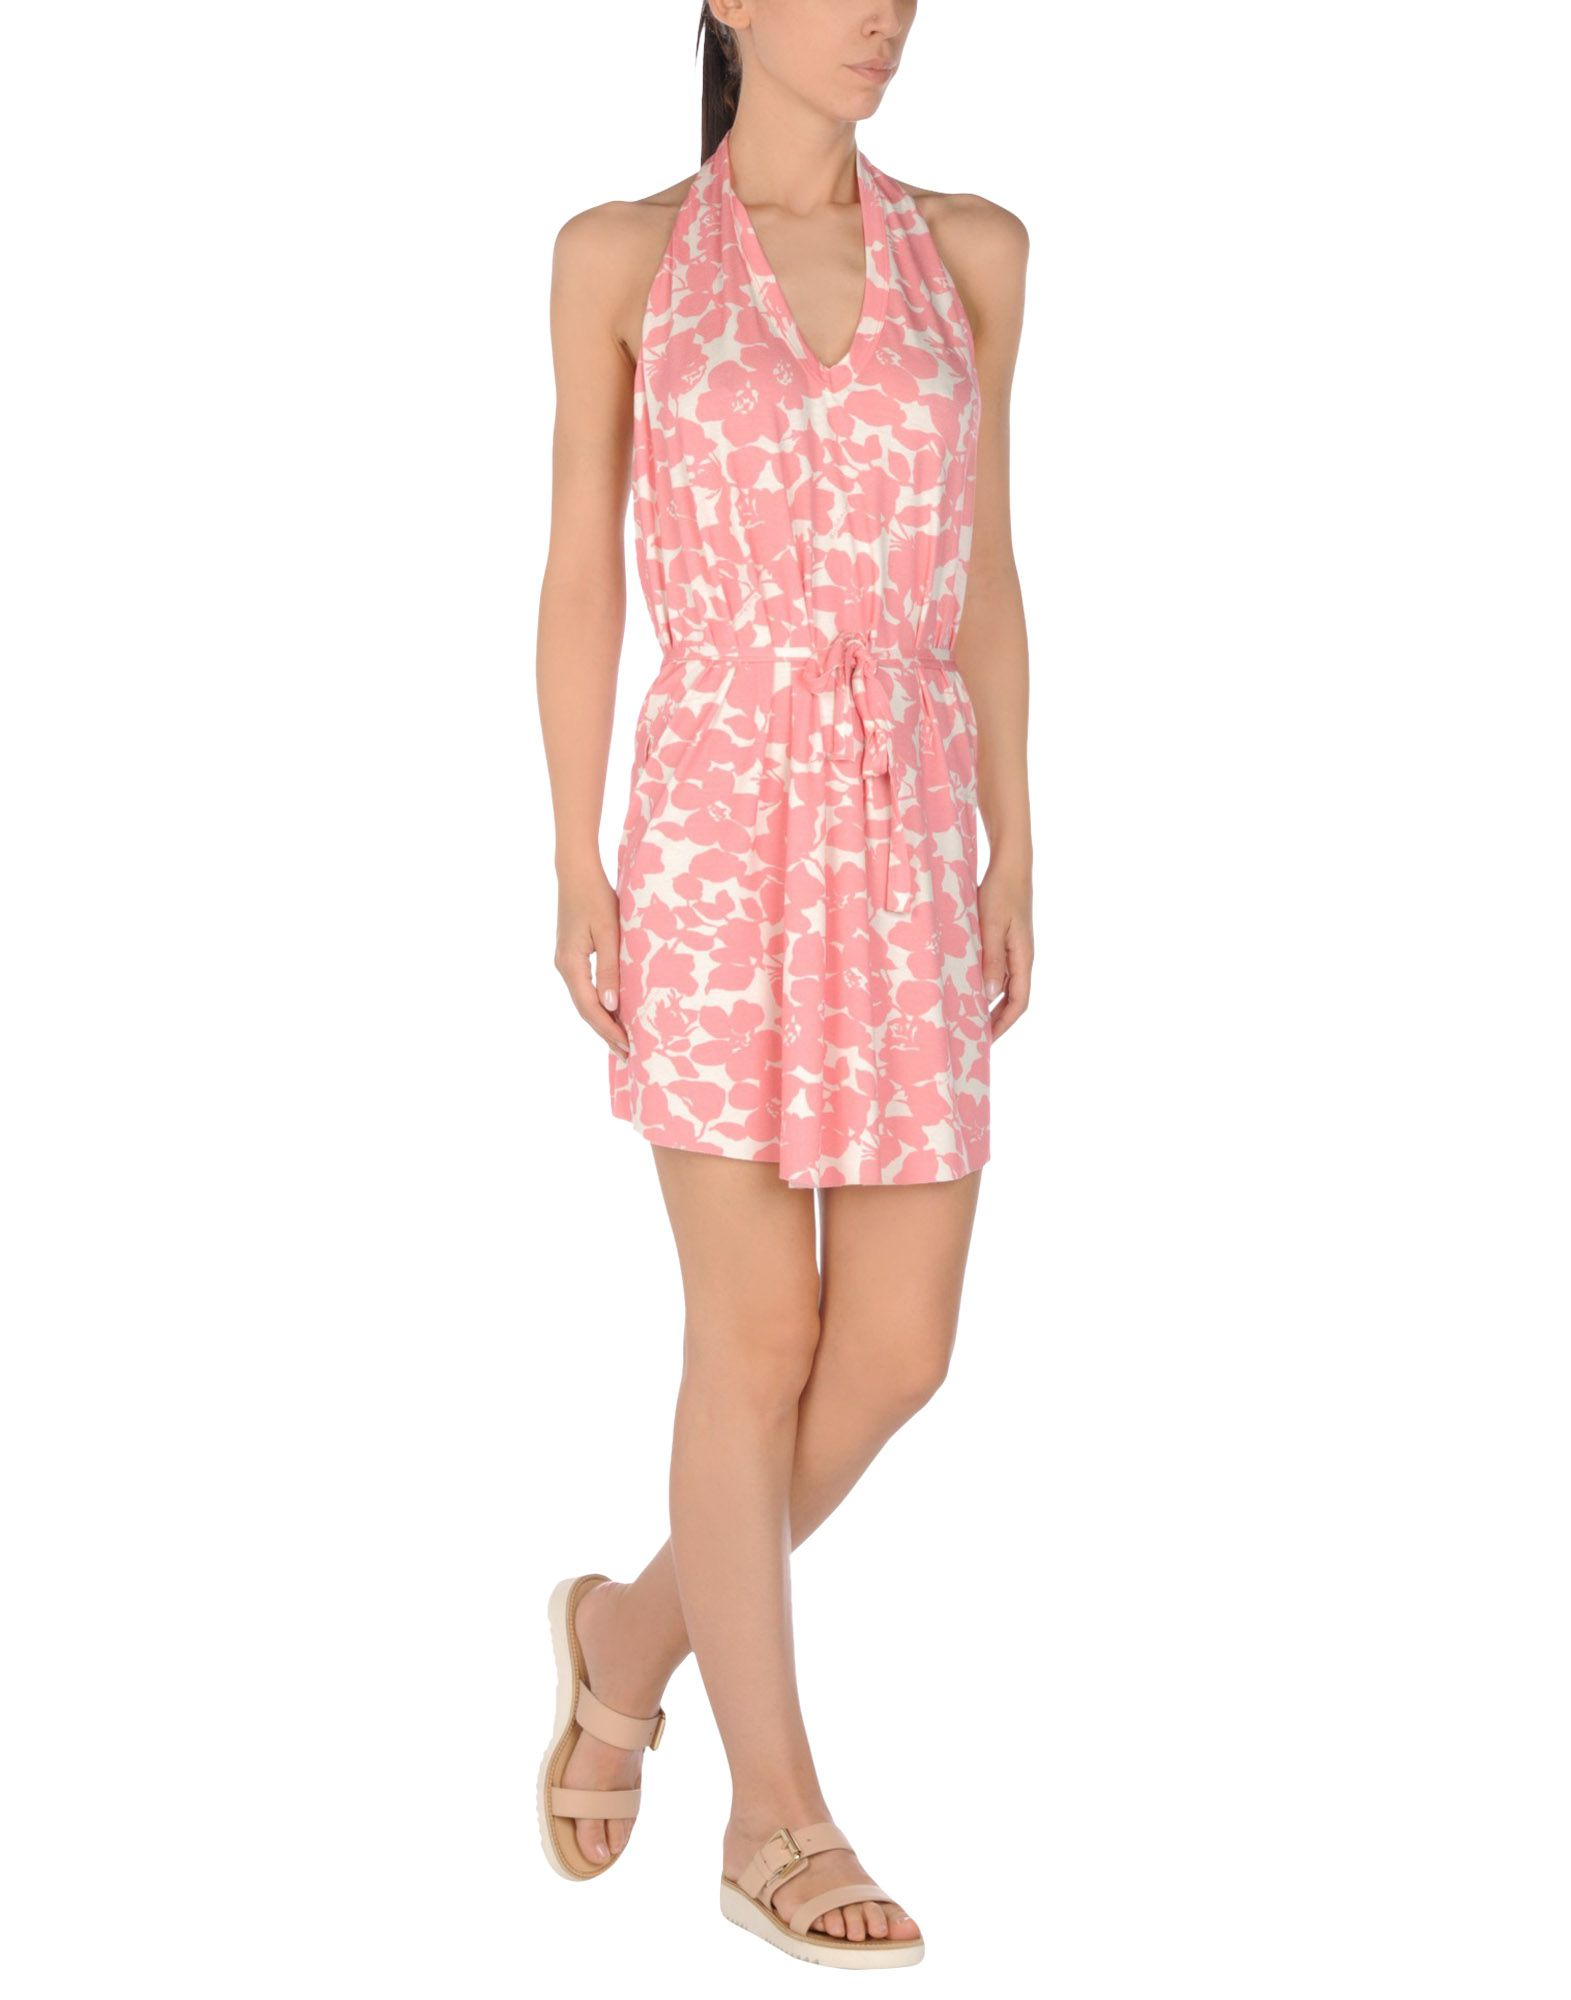 MISS BIKINI Пляжное платье топ miss selfridge miss selfridge mi035ewvqn62